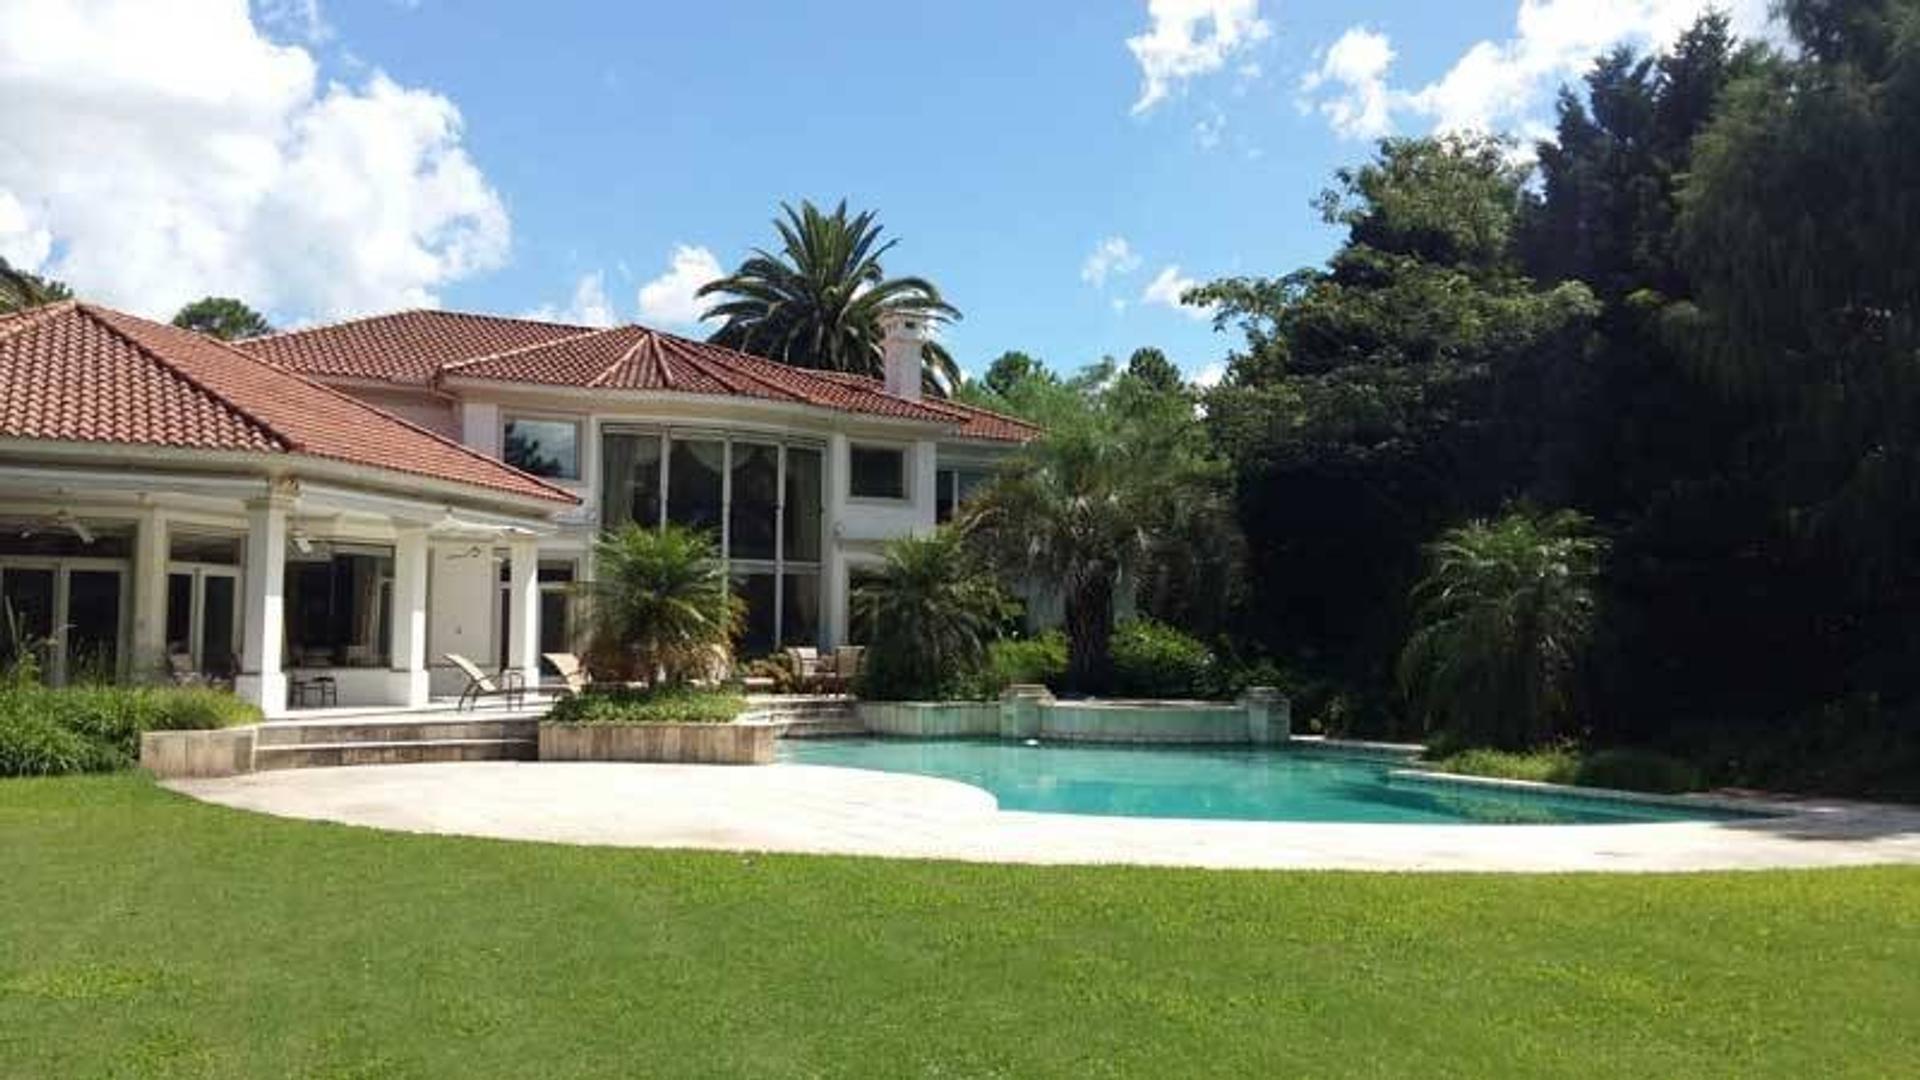 Venta de Espectacular Casa en Mayling - Pilar